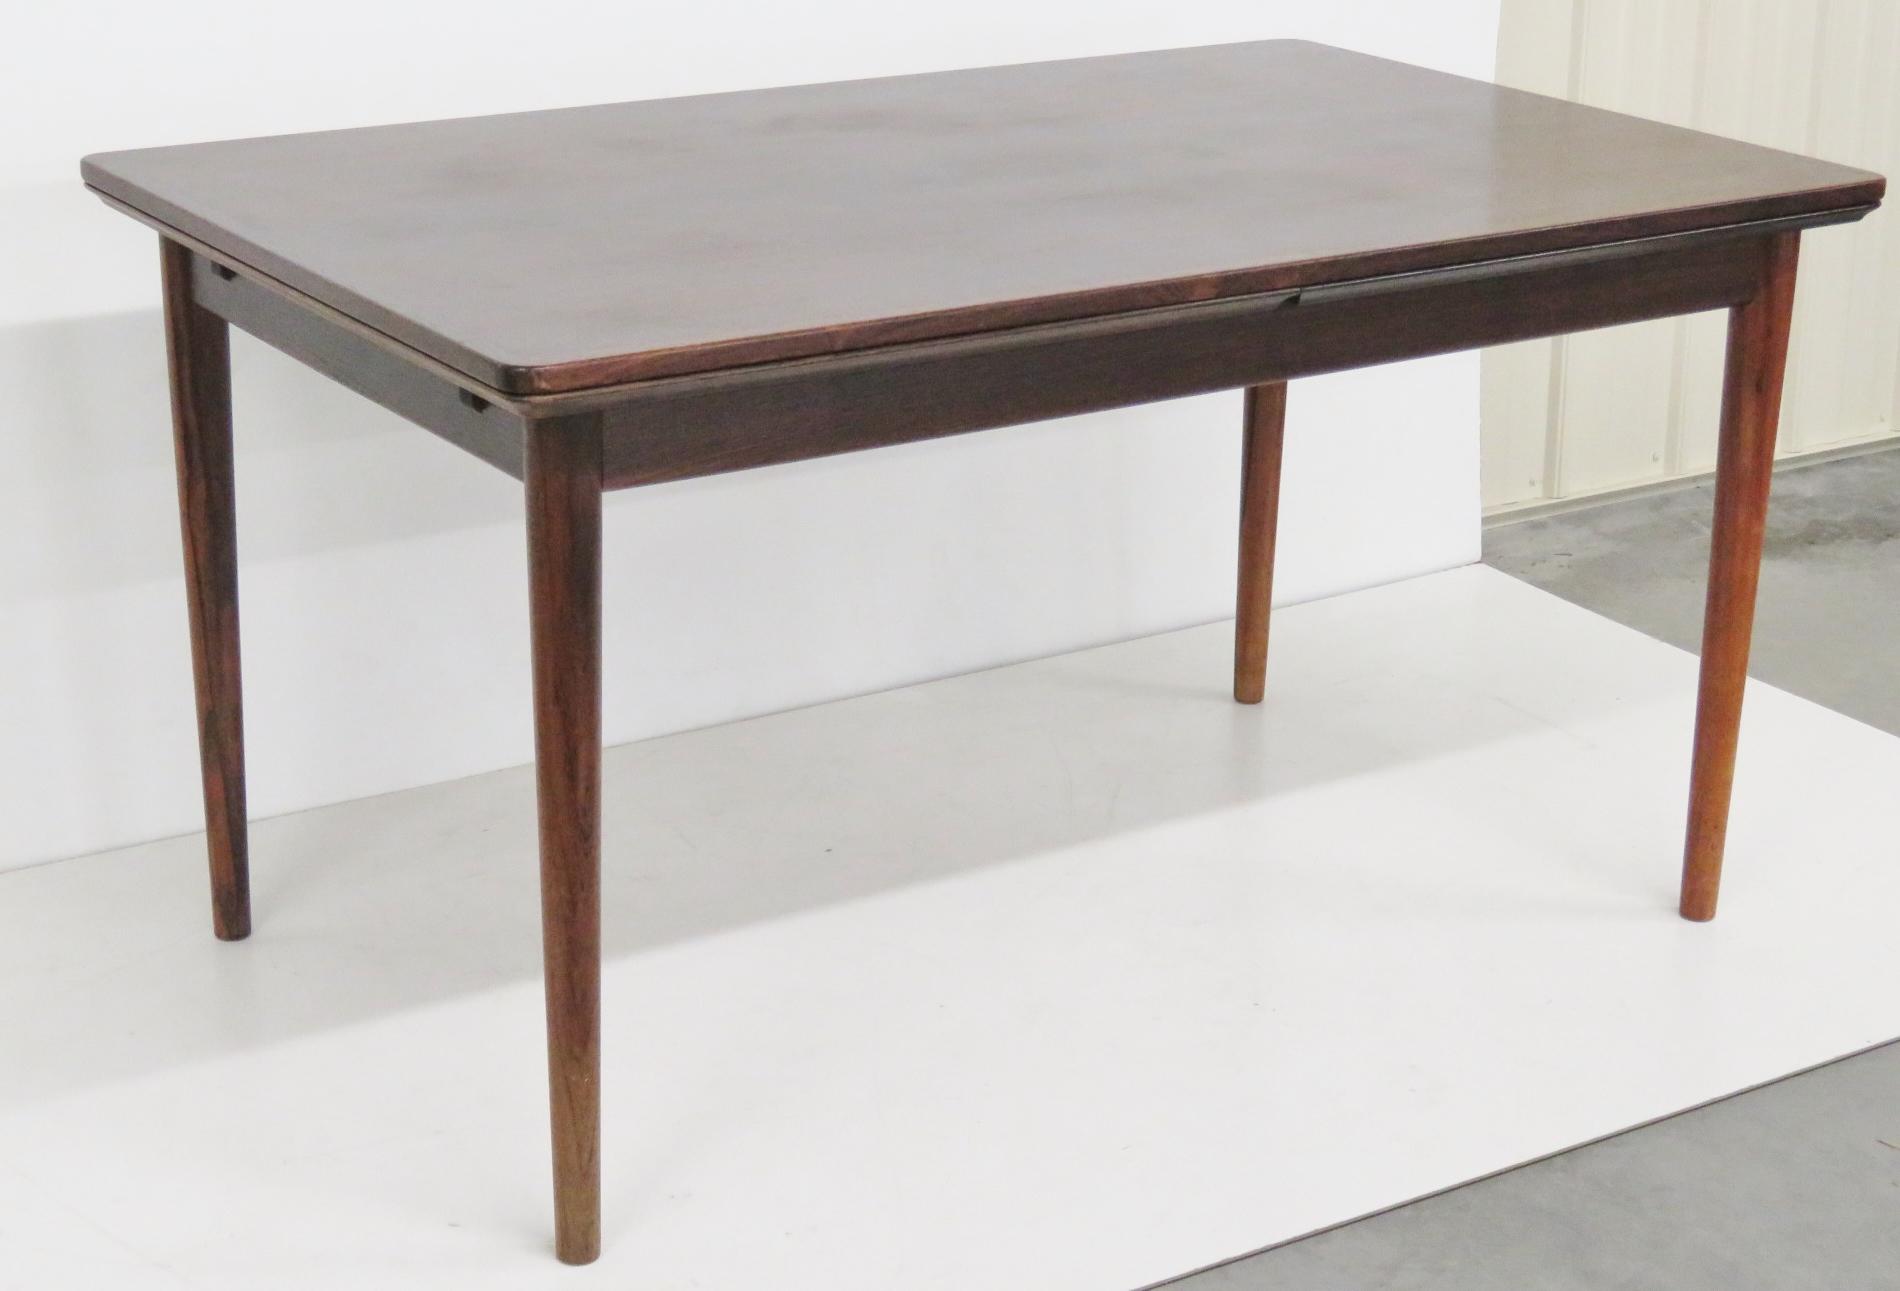 Danish Modern Rosewood Dining Table Chairish : a2b5c86d b083 420b 9a34 1e5ccd9916a4aspectfitampwidth640ampheight640 from www.chairish.com size 640 x 640 jpeg 23kB